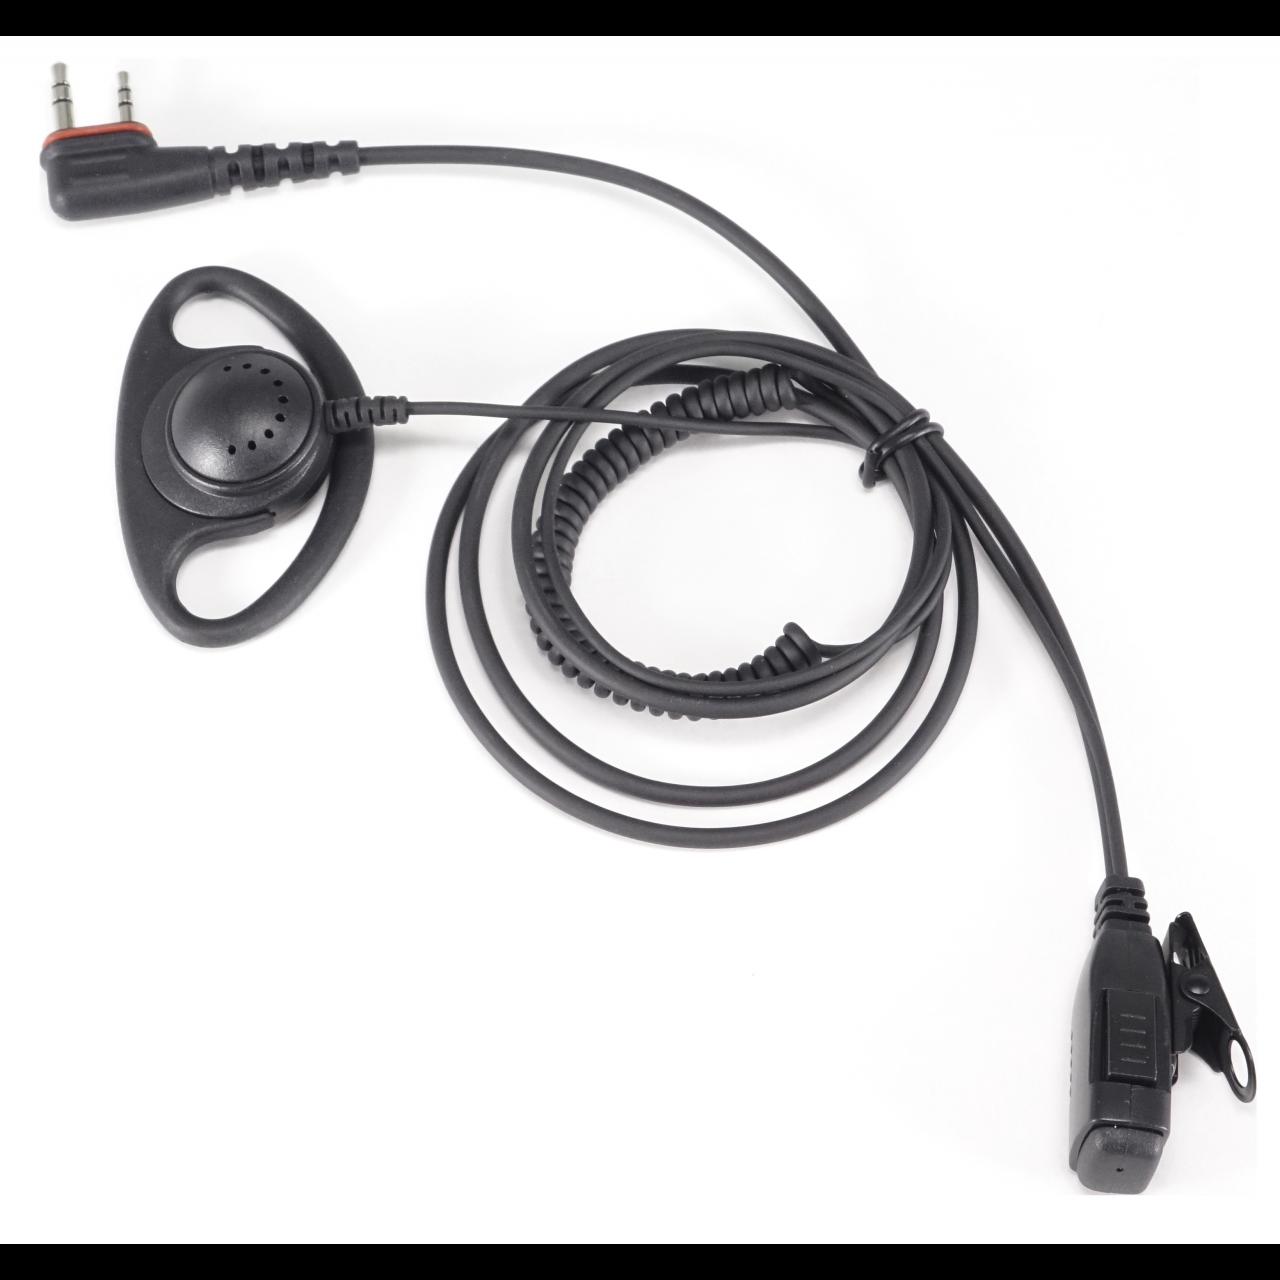 EP-RA3227C Headsets and earphones - ICOM